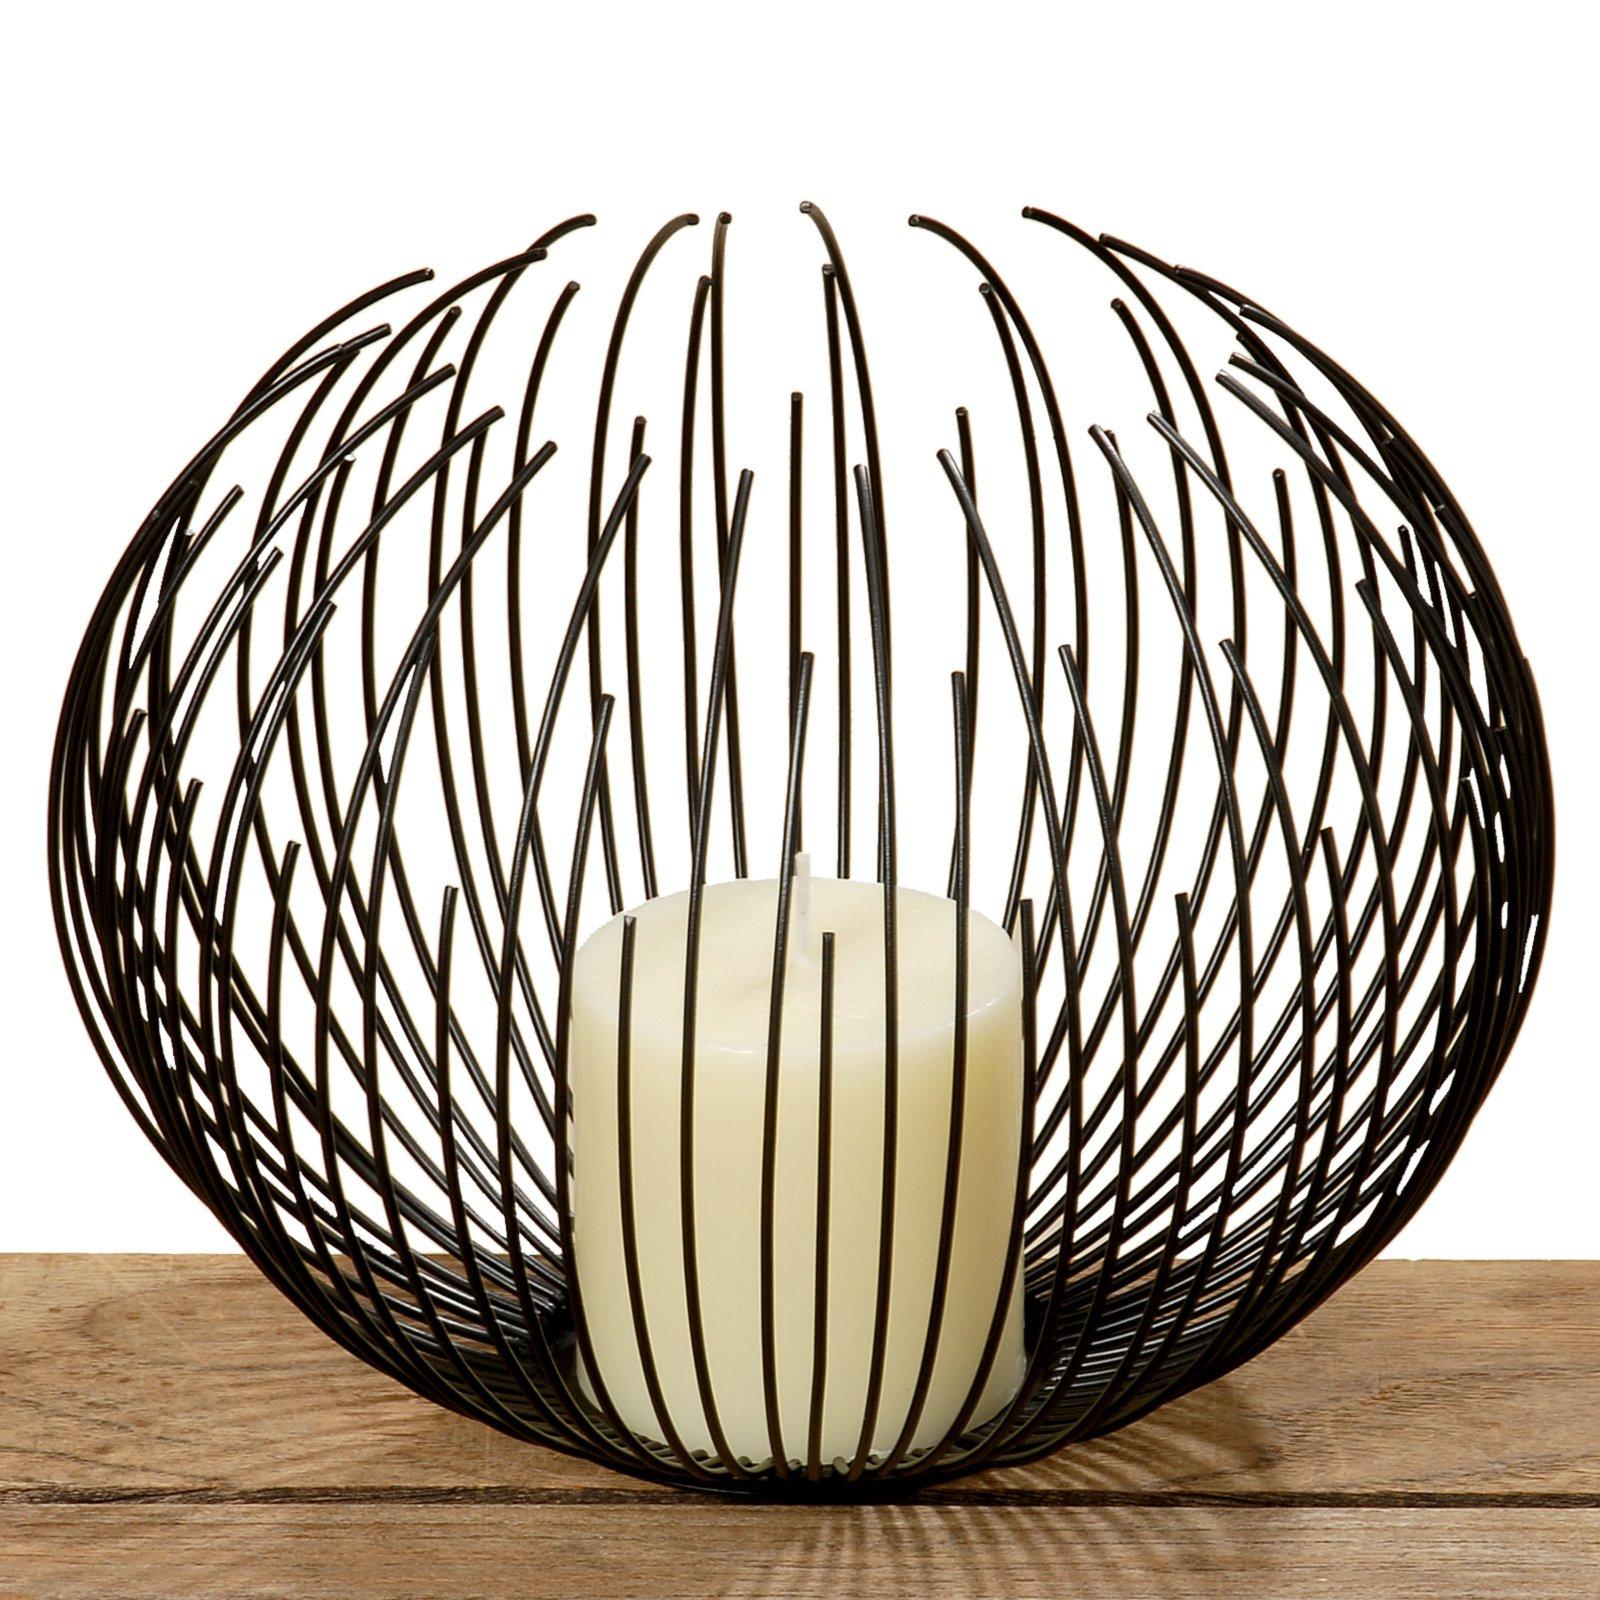 windlicht cylon schwarz metall mit kerze kerzen kerzenhalter deko artikel deko. Black Bedroom Furniture Sets. Home Design Ideas